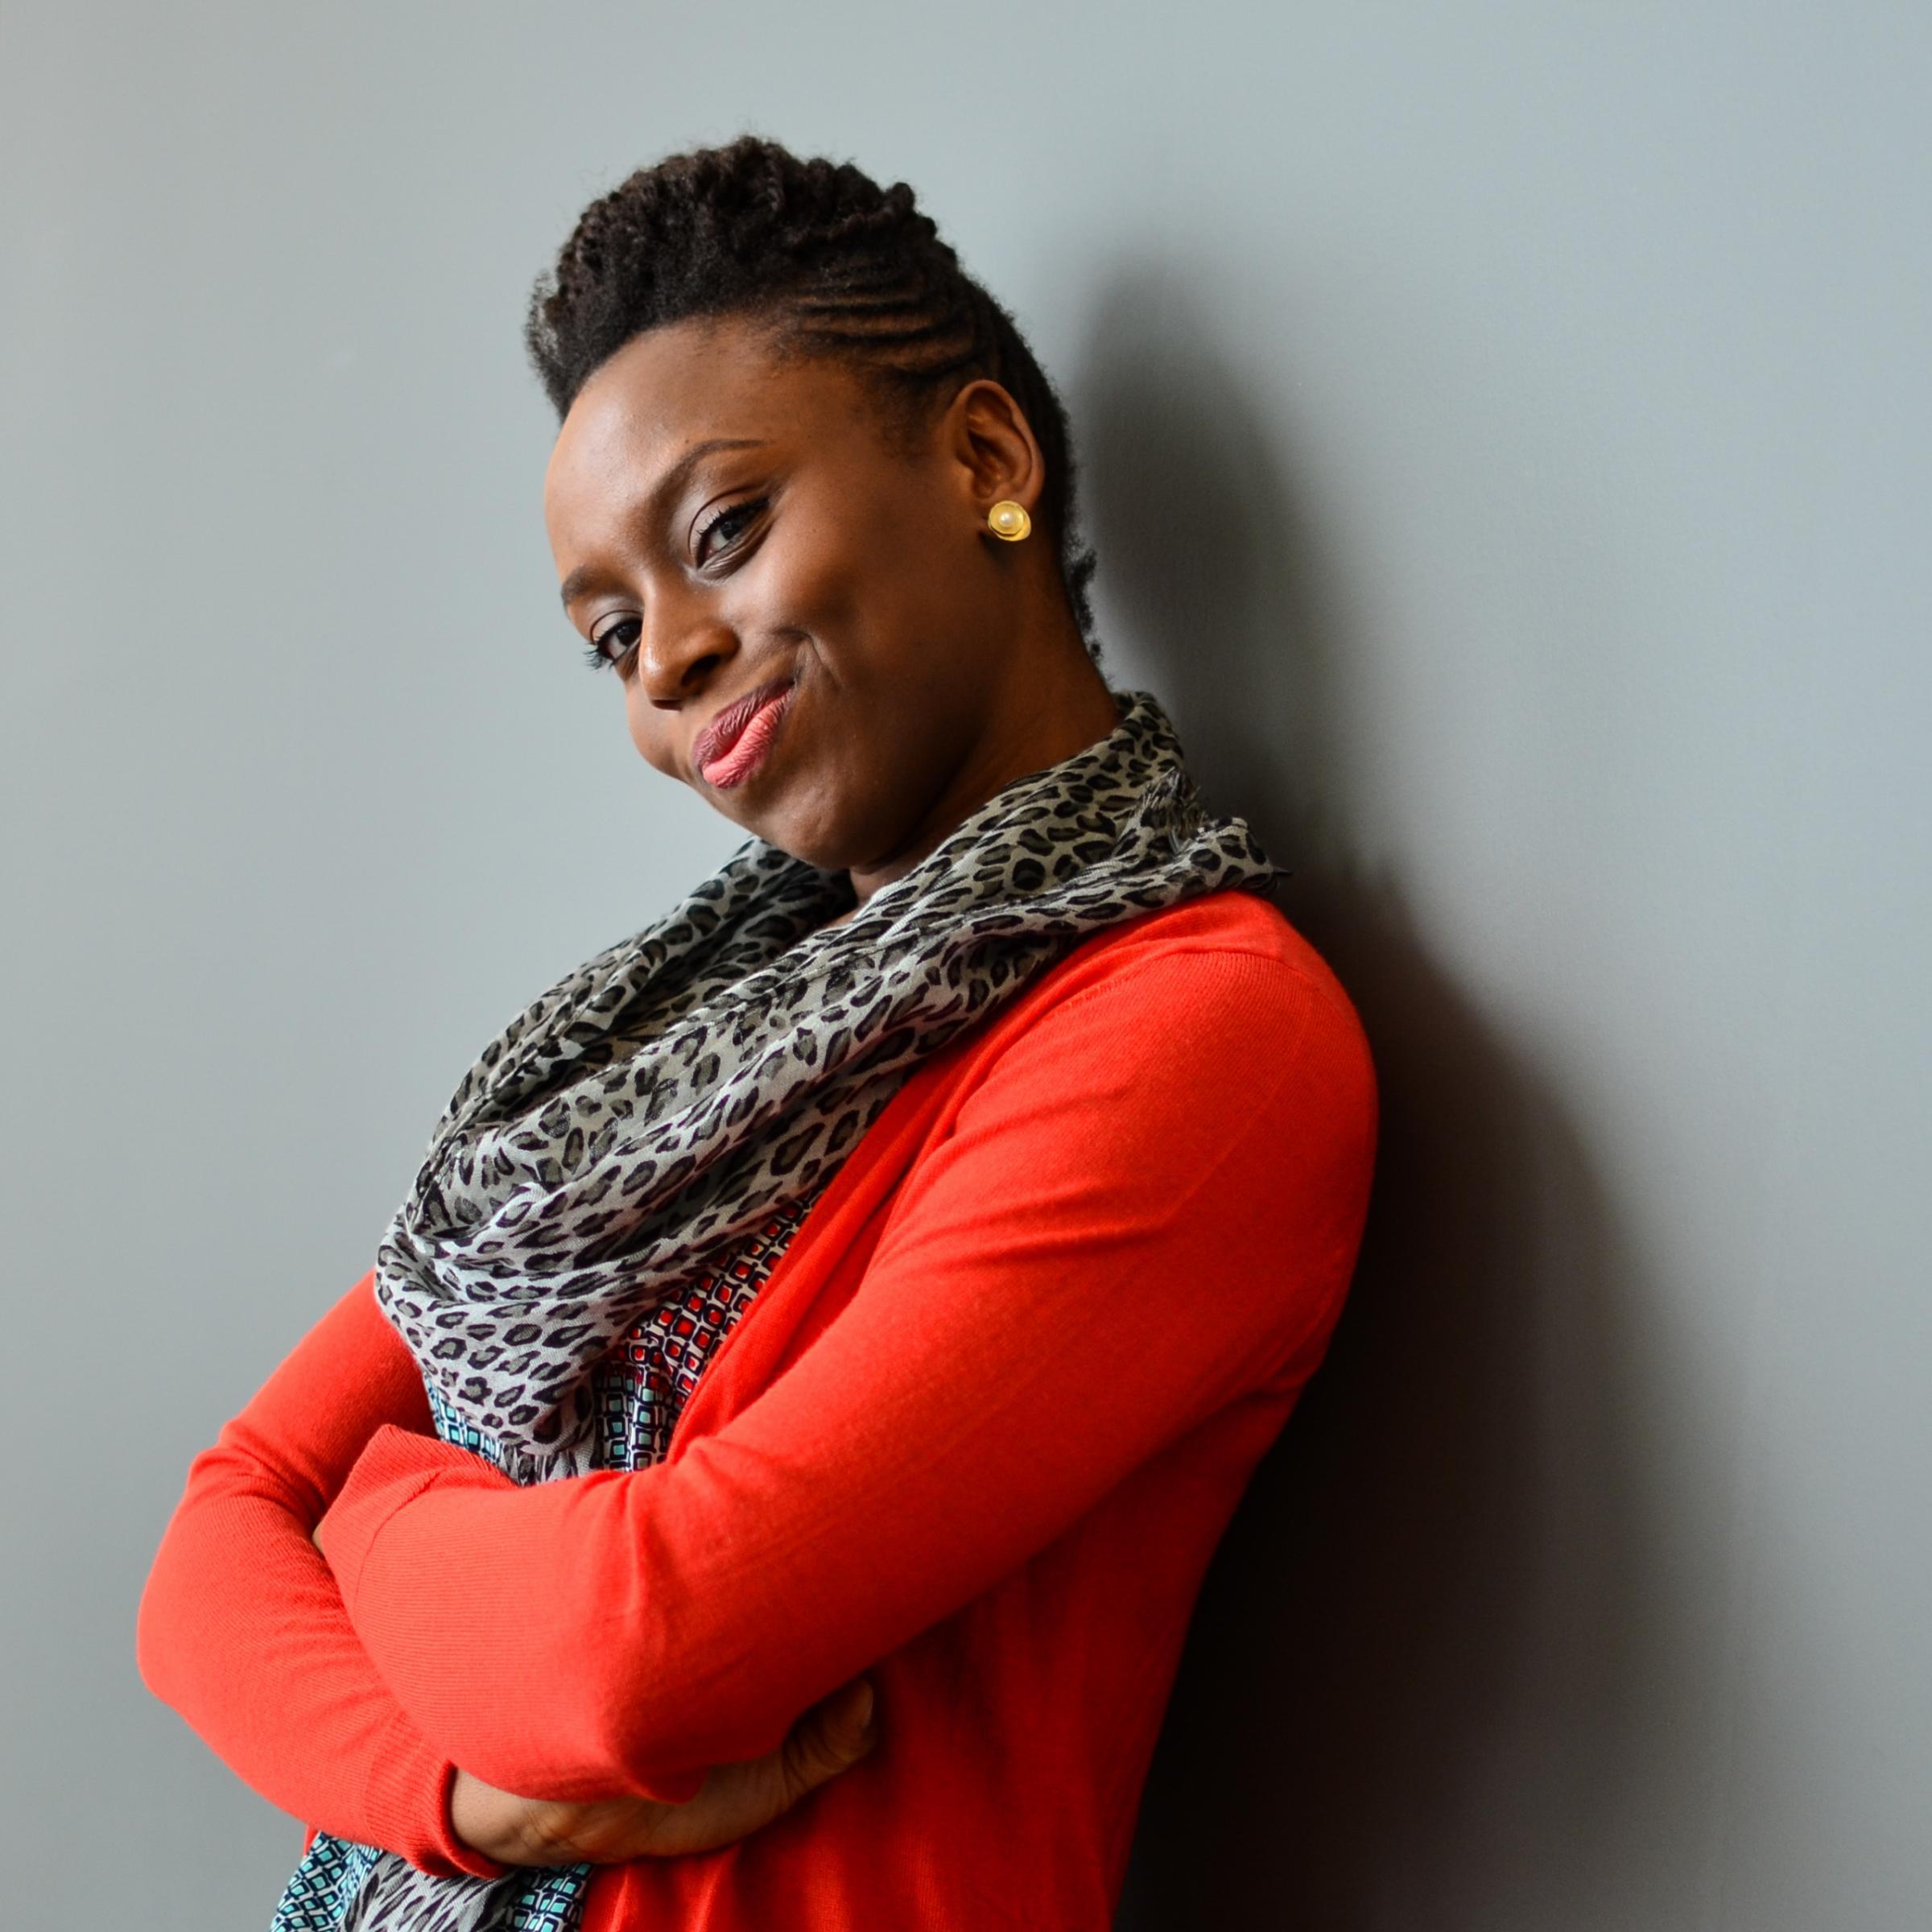 a biography of chimamanda adichie a nigerian novelist Half of a yellow sun novelist tells interviewer asks chimamanda ngozi adichie: bookshops in nigeria the prize-winning nigerian novelist was invited.